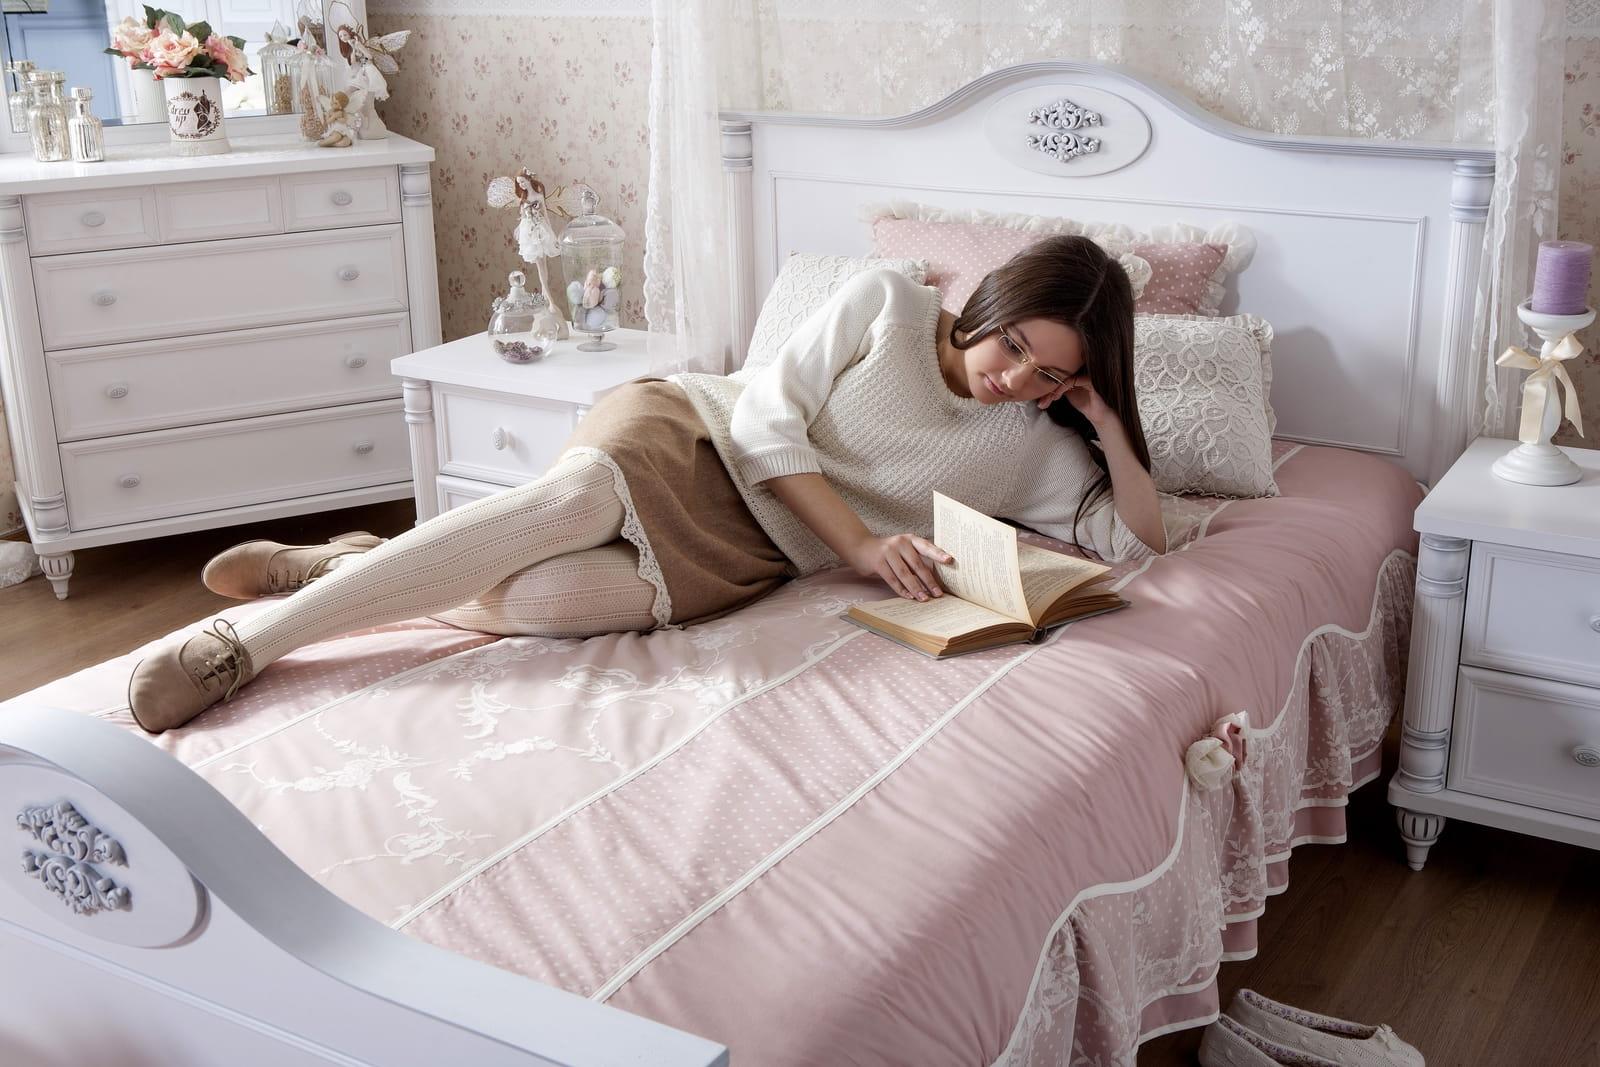 Tienerkamer ikea bed hip huisje deco slaapkamer tiener meisje